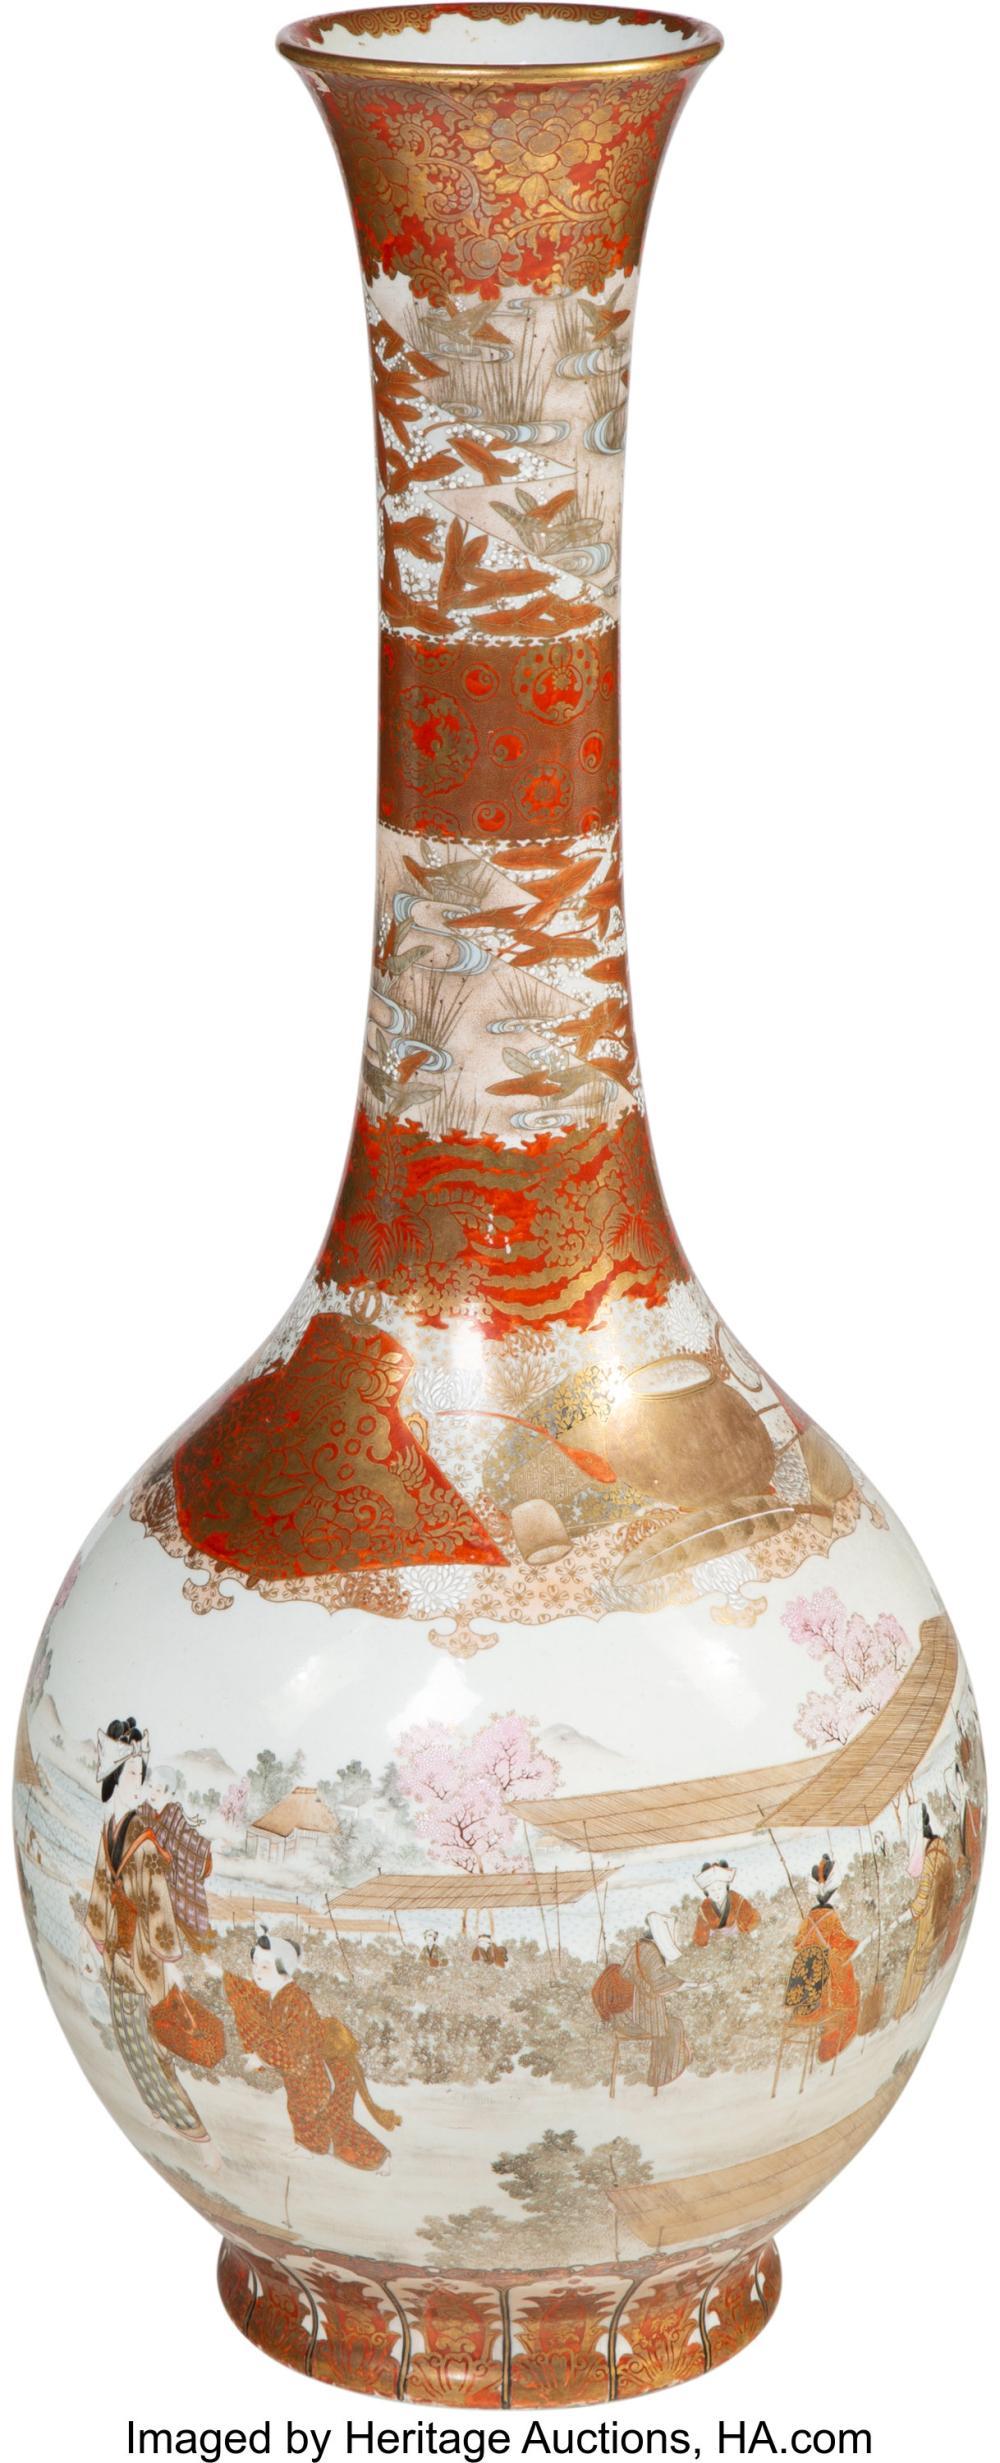 Lot 21254: A Japanese Partial Gilt Enameled Kutani Porcelain Floor Vase, Meiji Period Marks